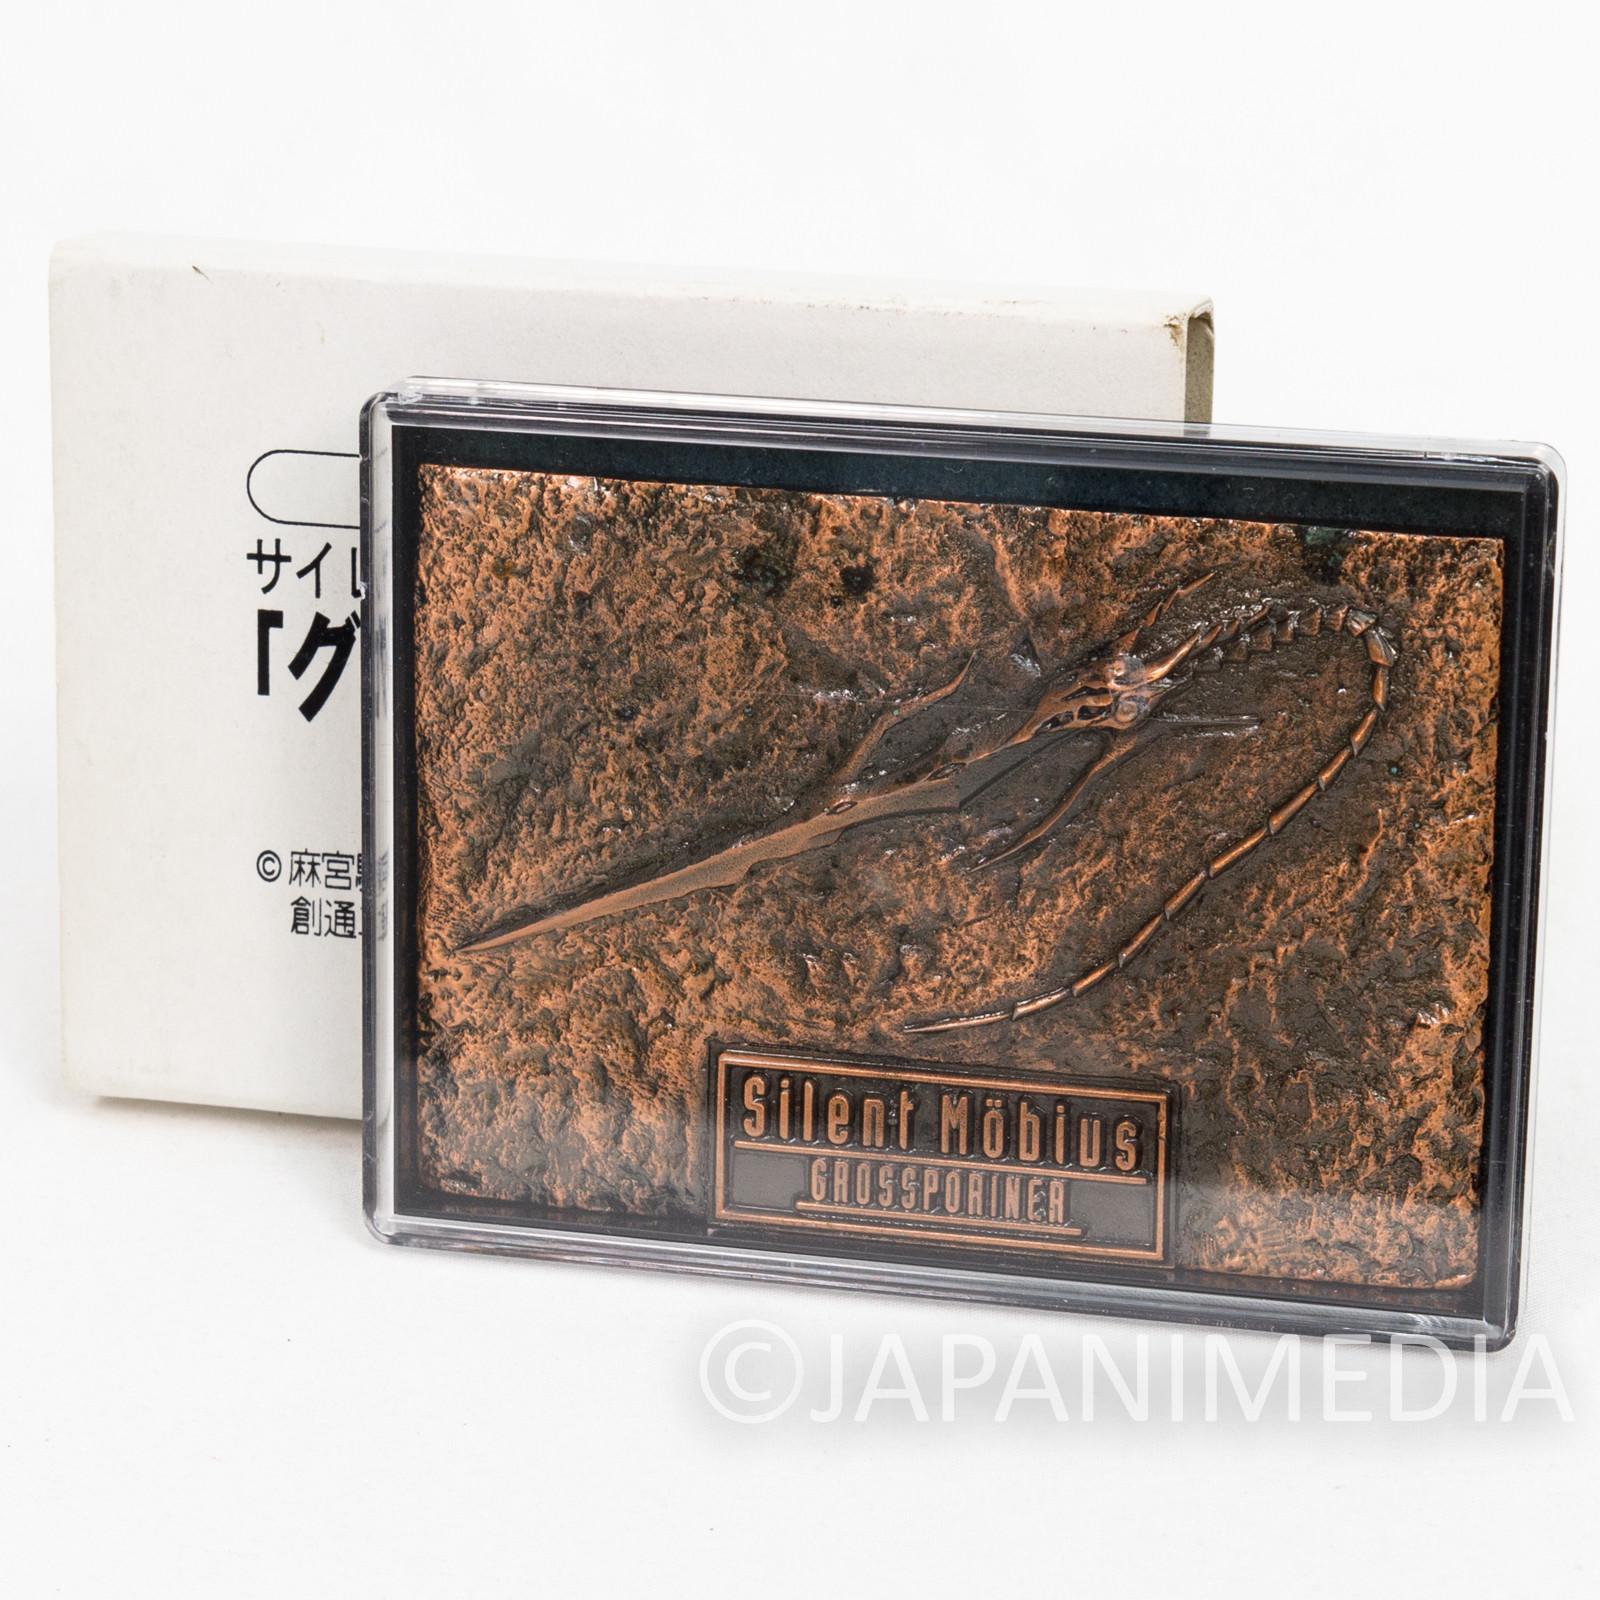 Silent Mobius Grossporiner Metal Plate Relief JAPAN ANIME MANGA